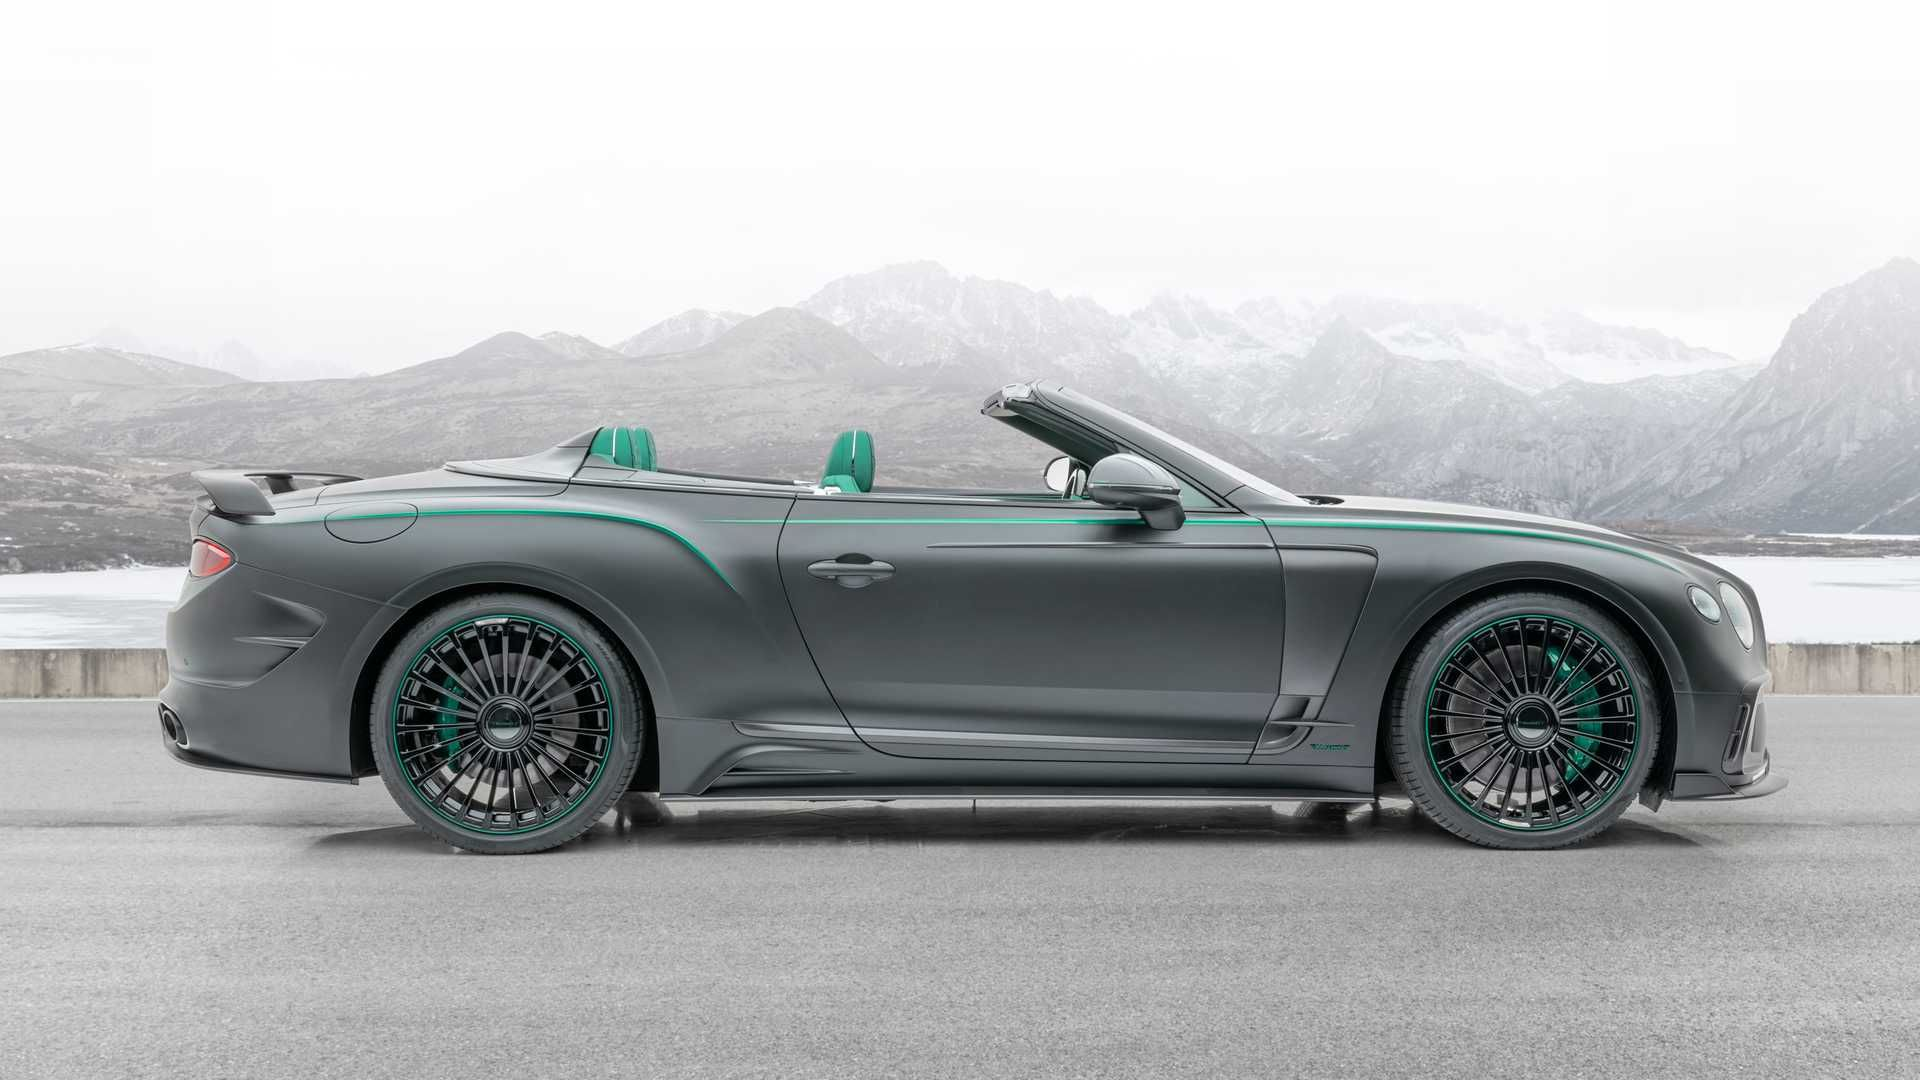 Bentley-Continental-GTC-V8-Cabriolet-Mansory-3